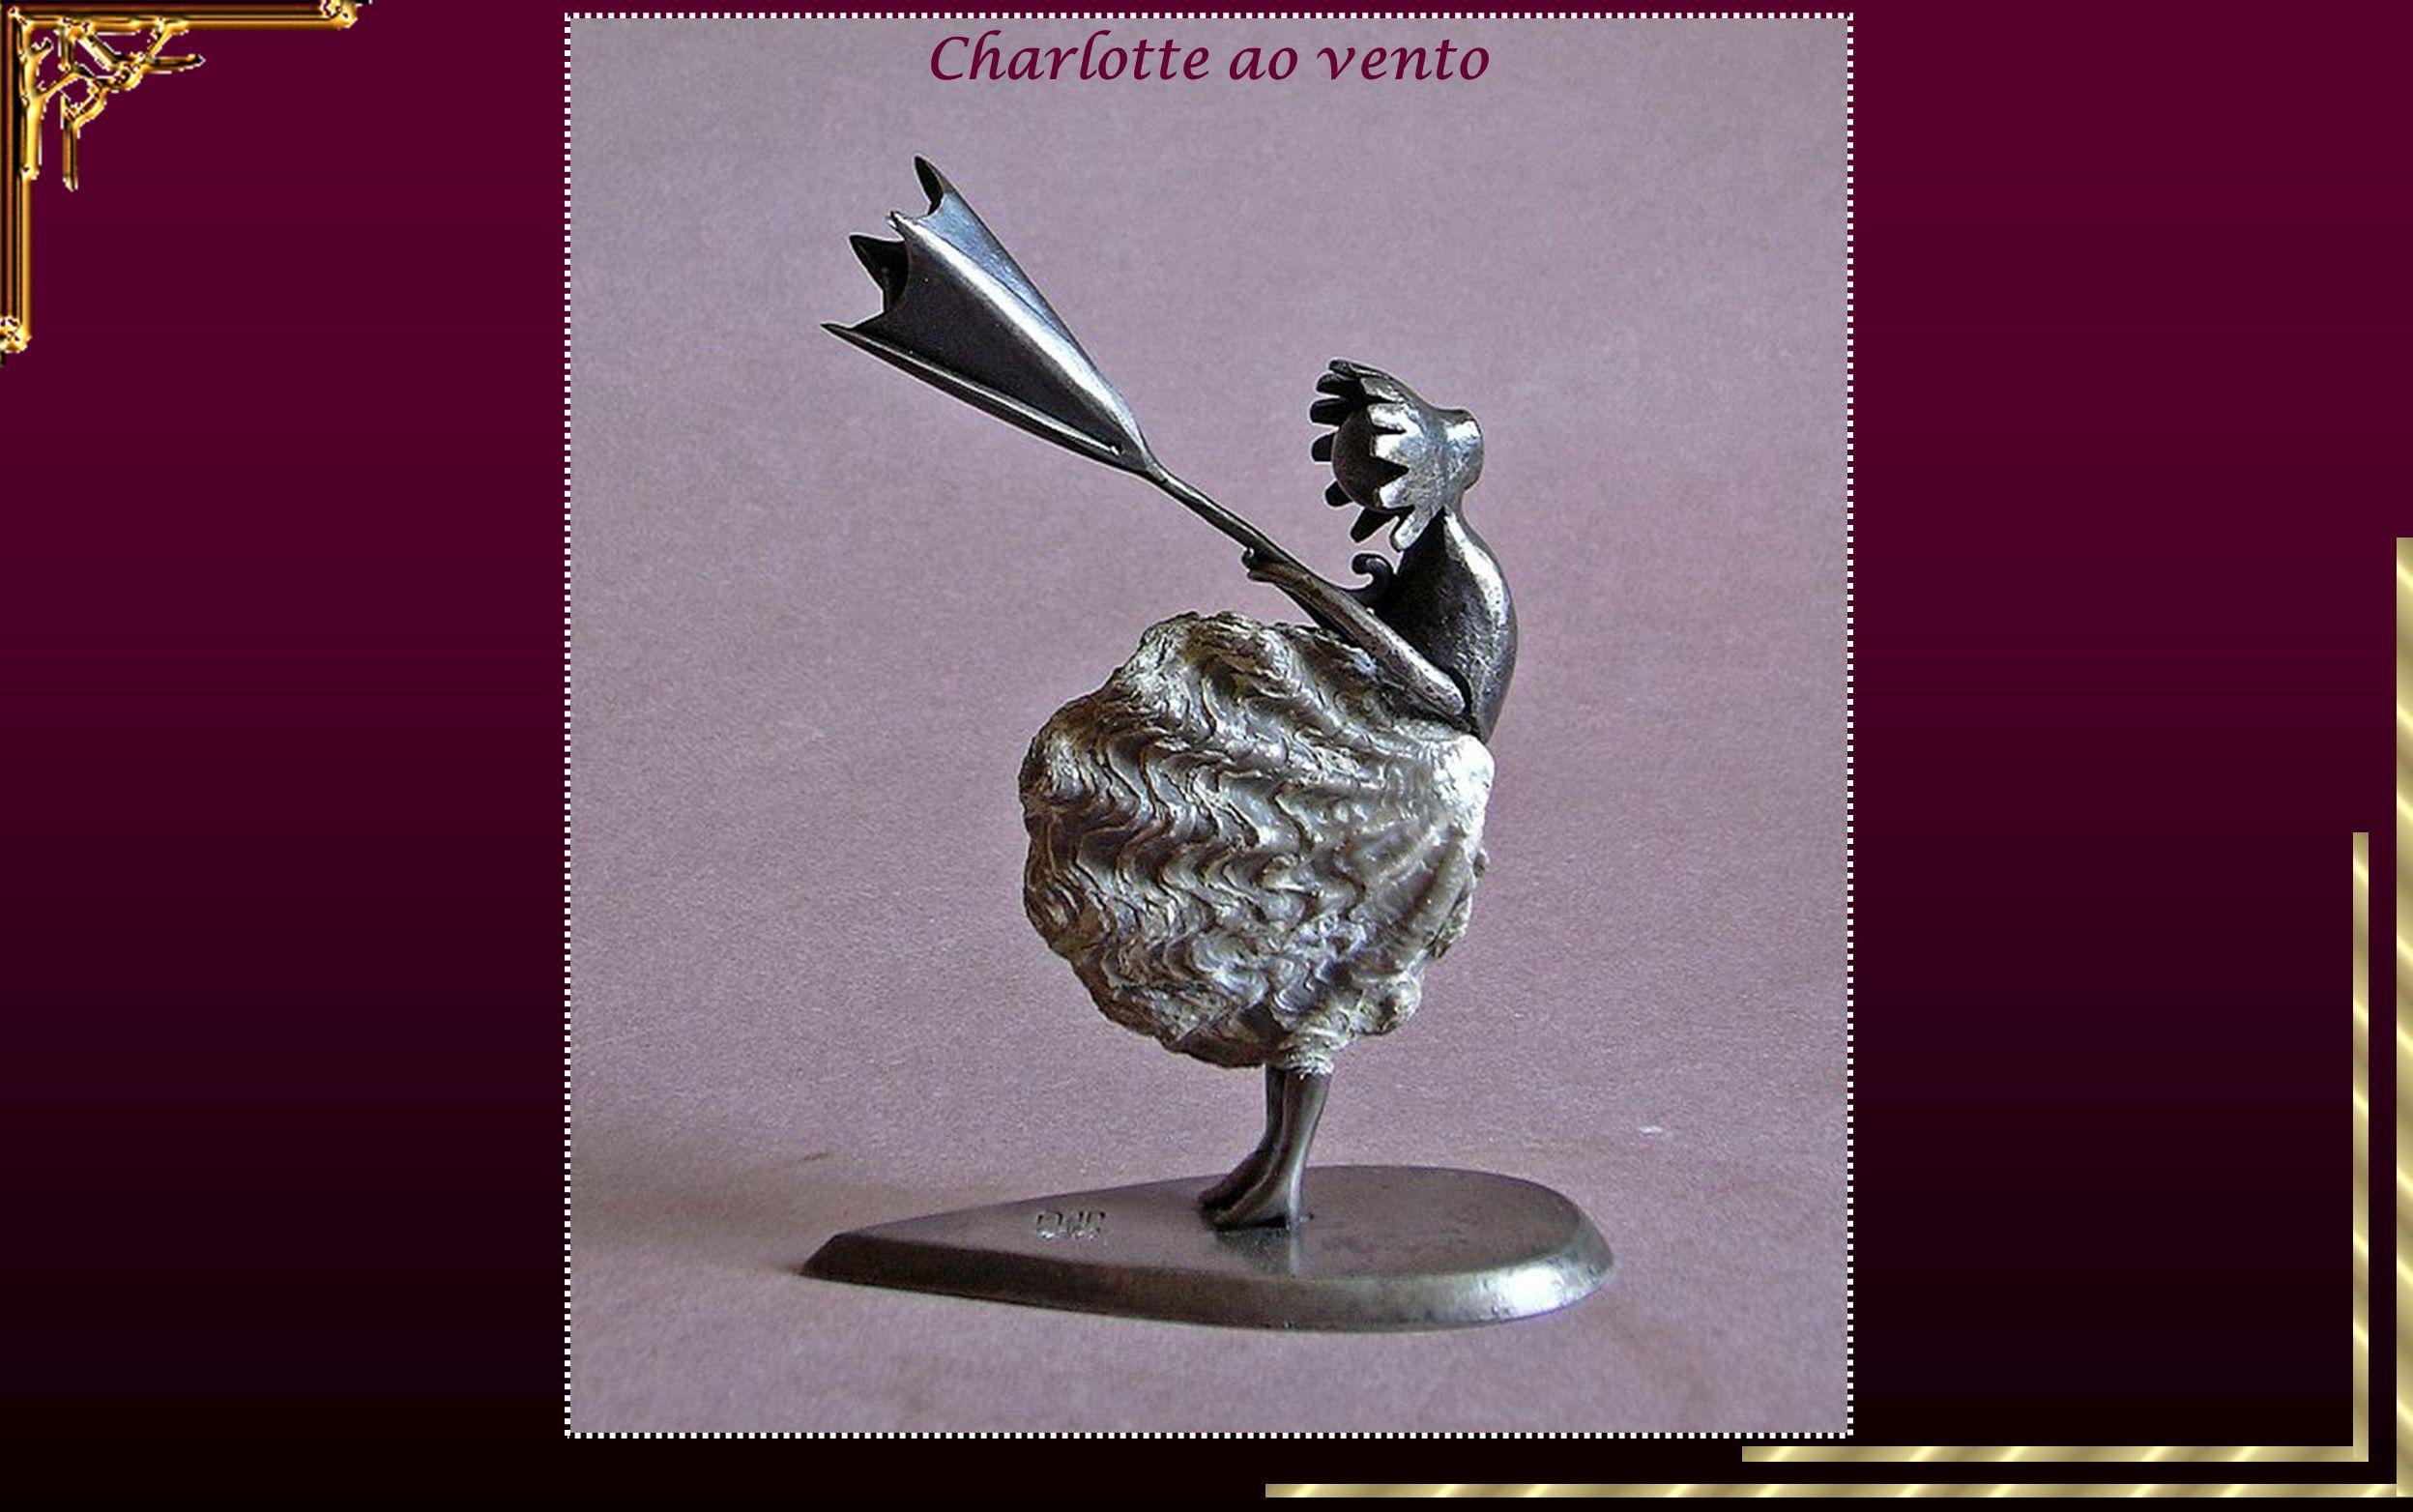 Charlotte ao vento